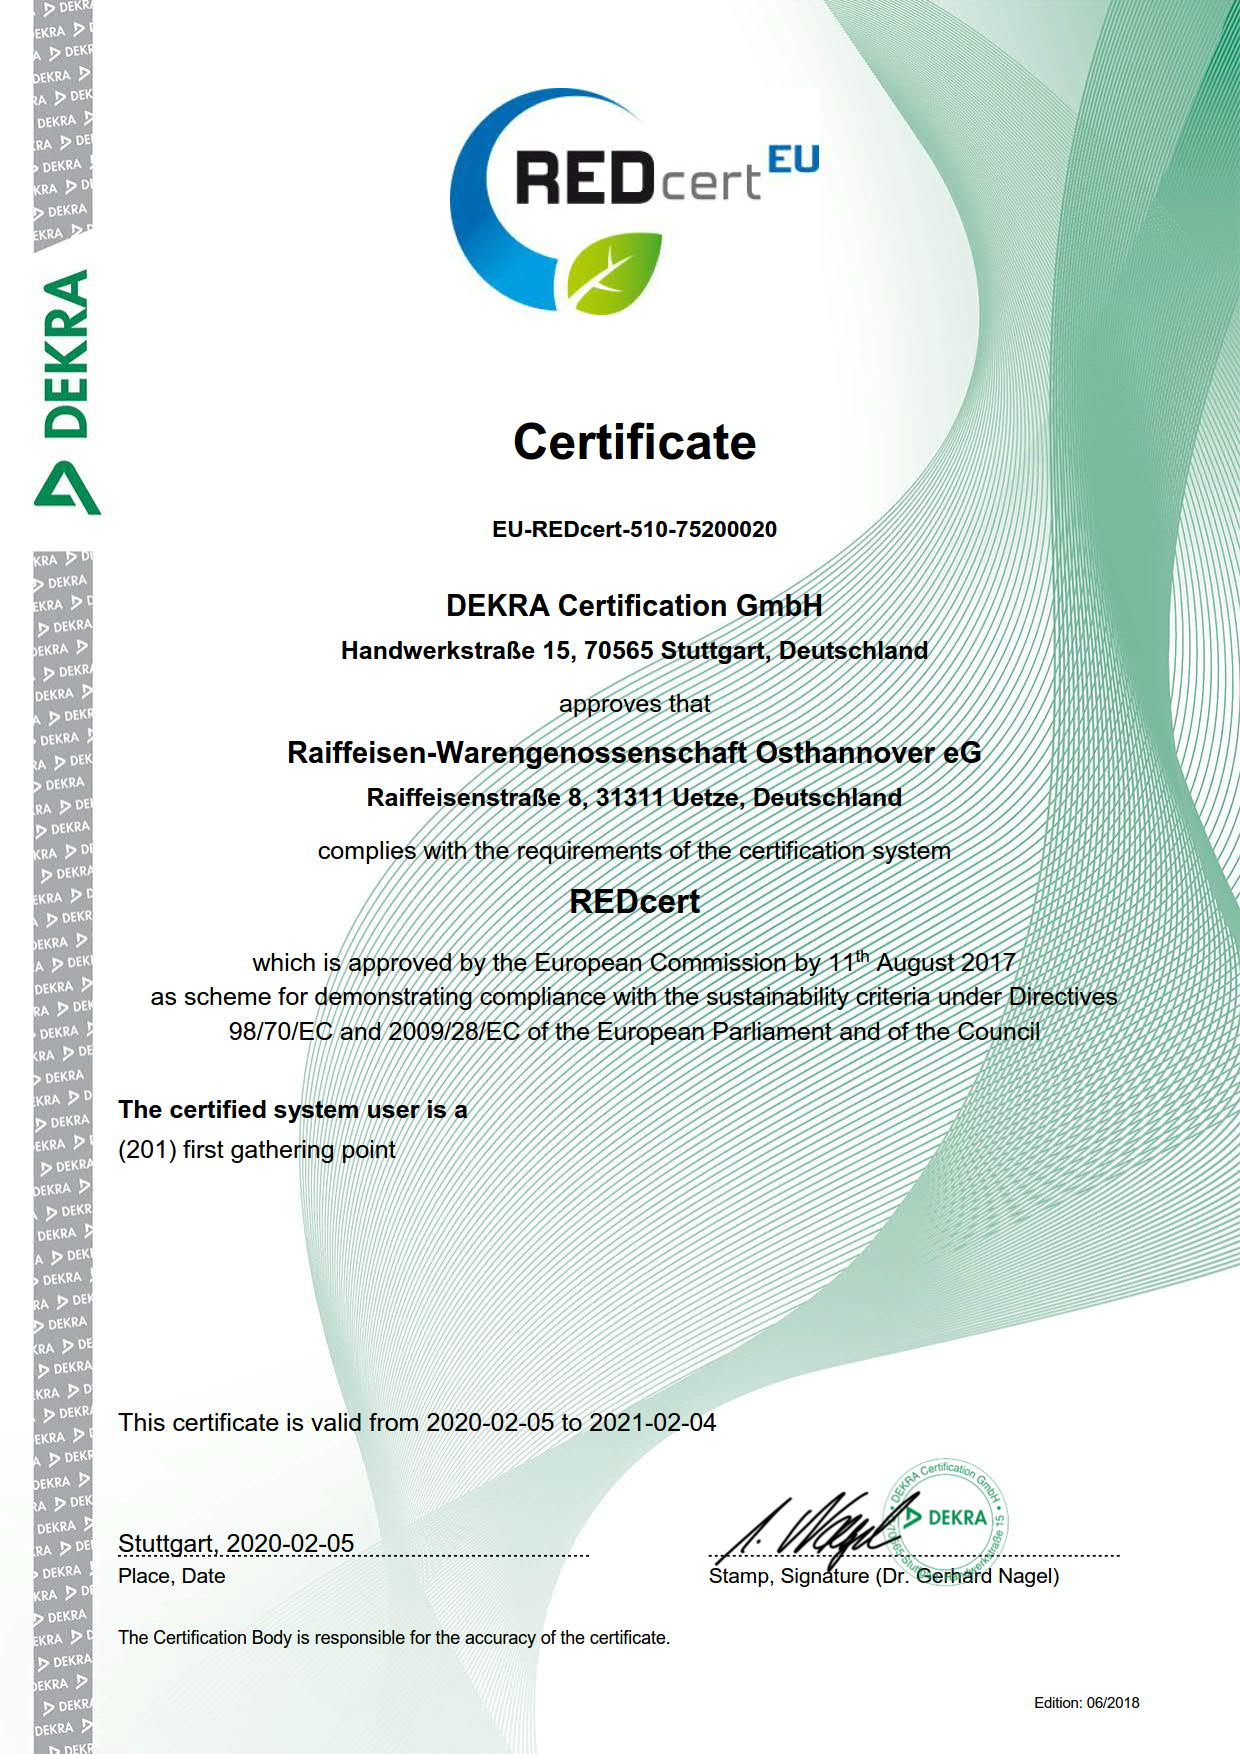 Zertifikate/2020_Zertifikat_REDcert_EU_Feb._2020.jpg